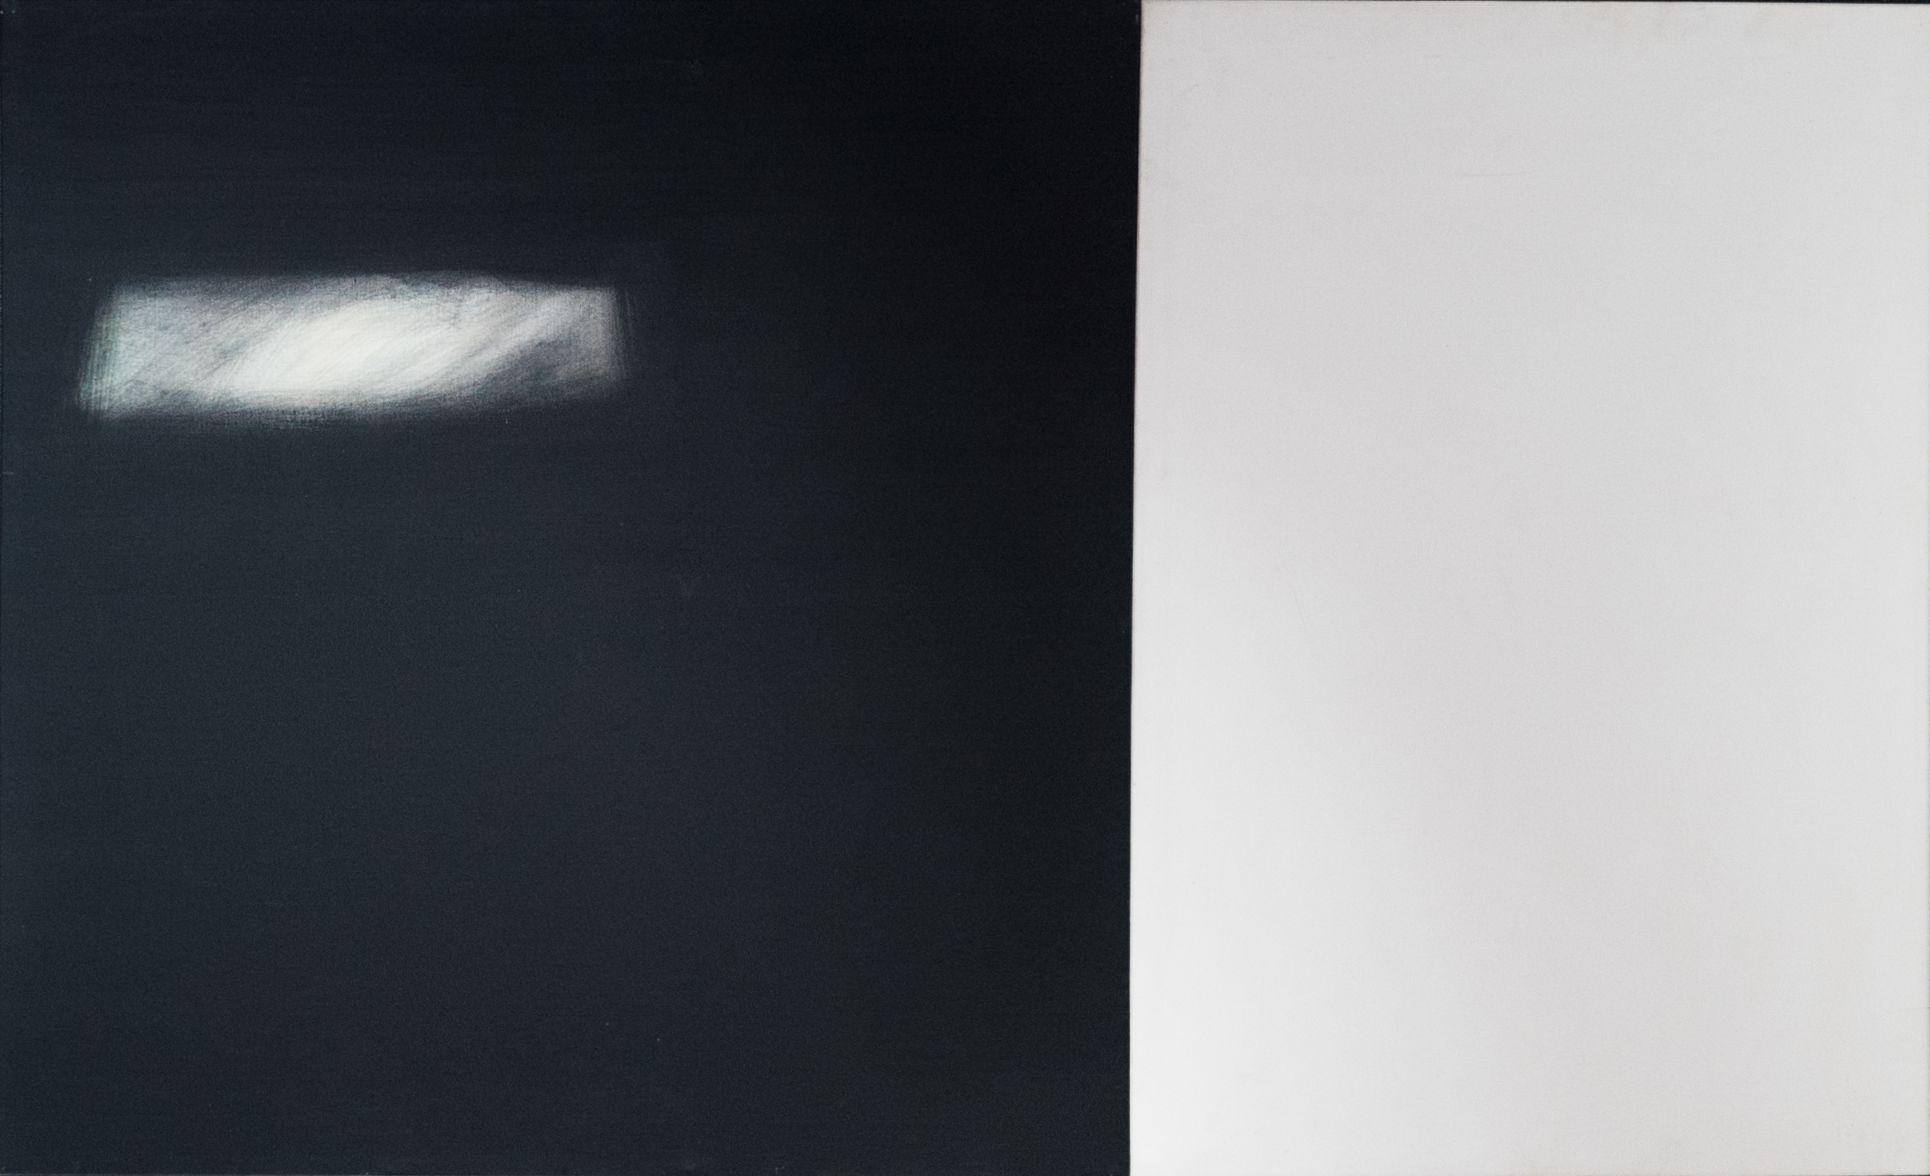 Saro Brancato, Riverbero luminoso, 2010